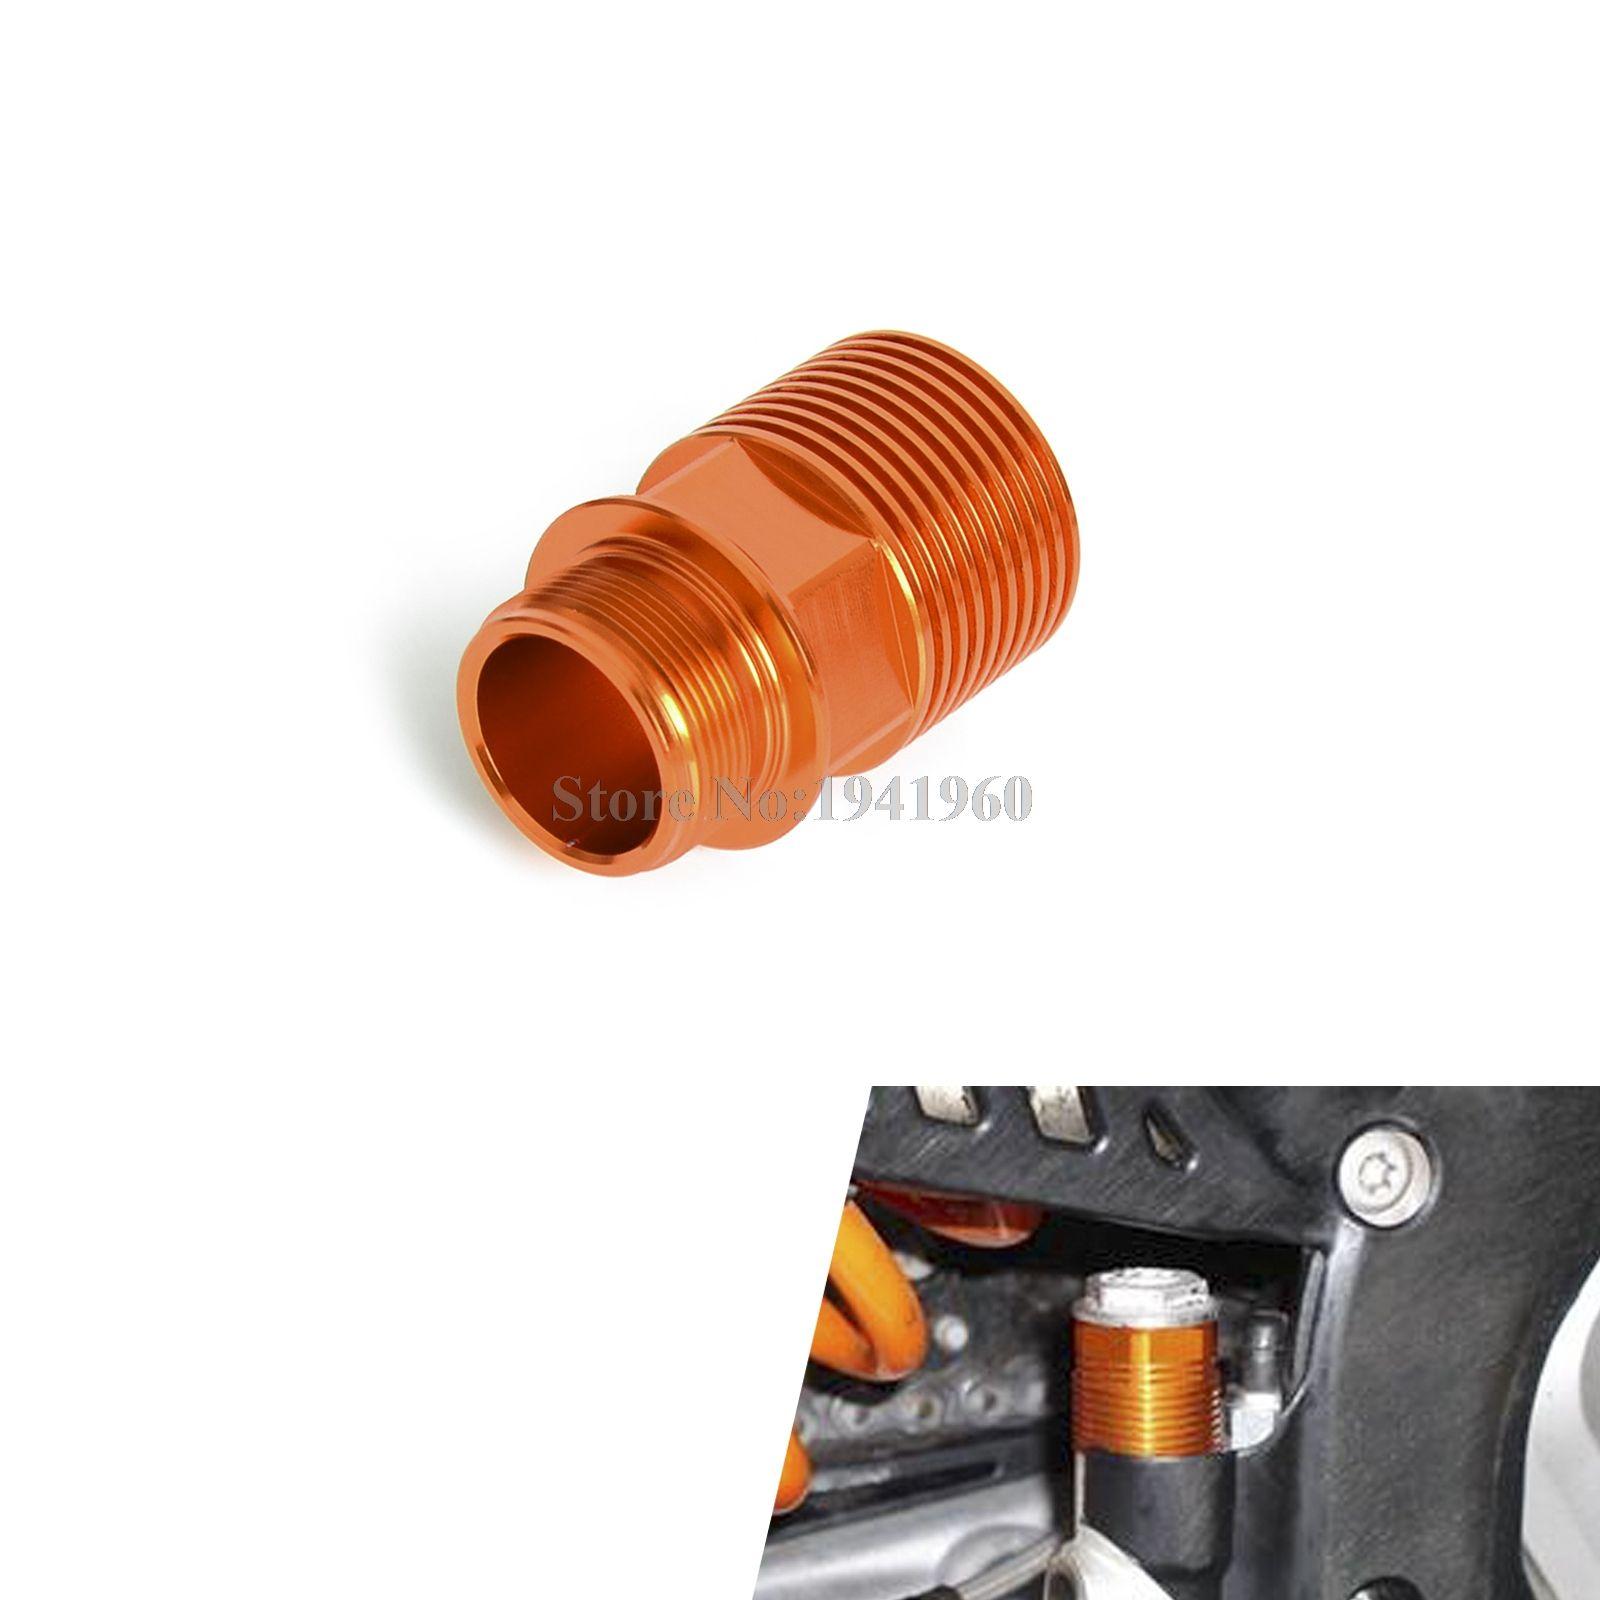 Rear Brake Reservoir Extender For KTM 125 250 350 450 500 525 530 SX SXF XC XCW EXC EXCF 2004-2014 2015 2016 Husqvarna TE FE TC